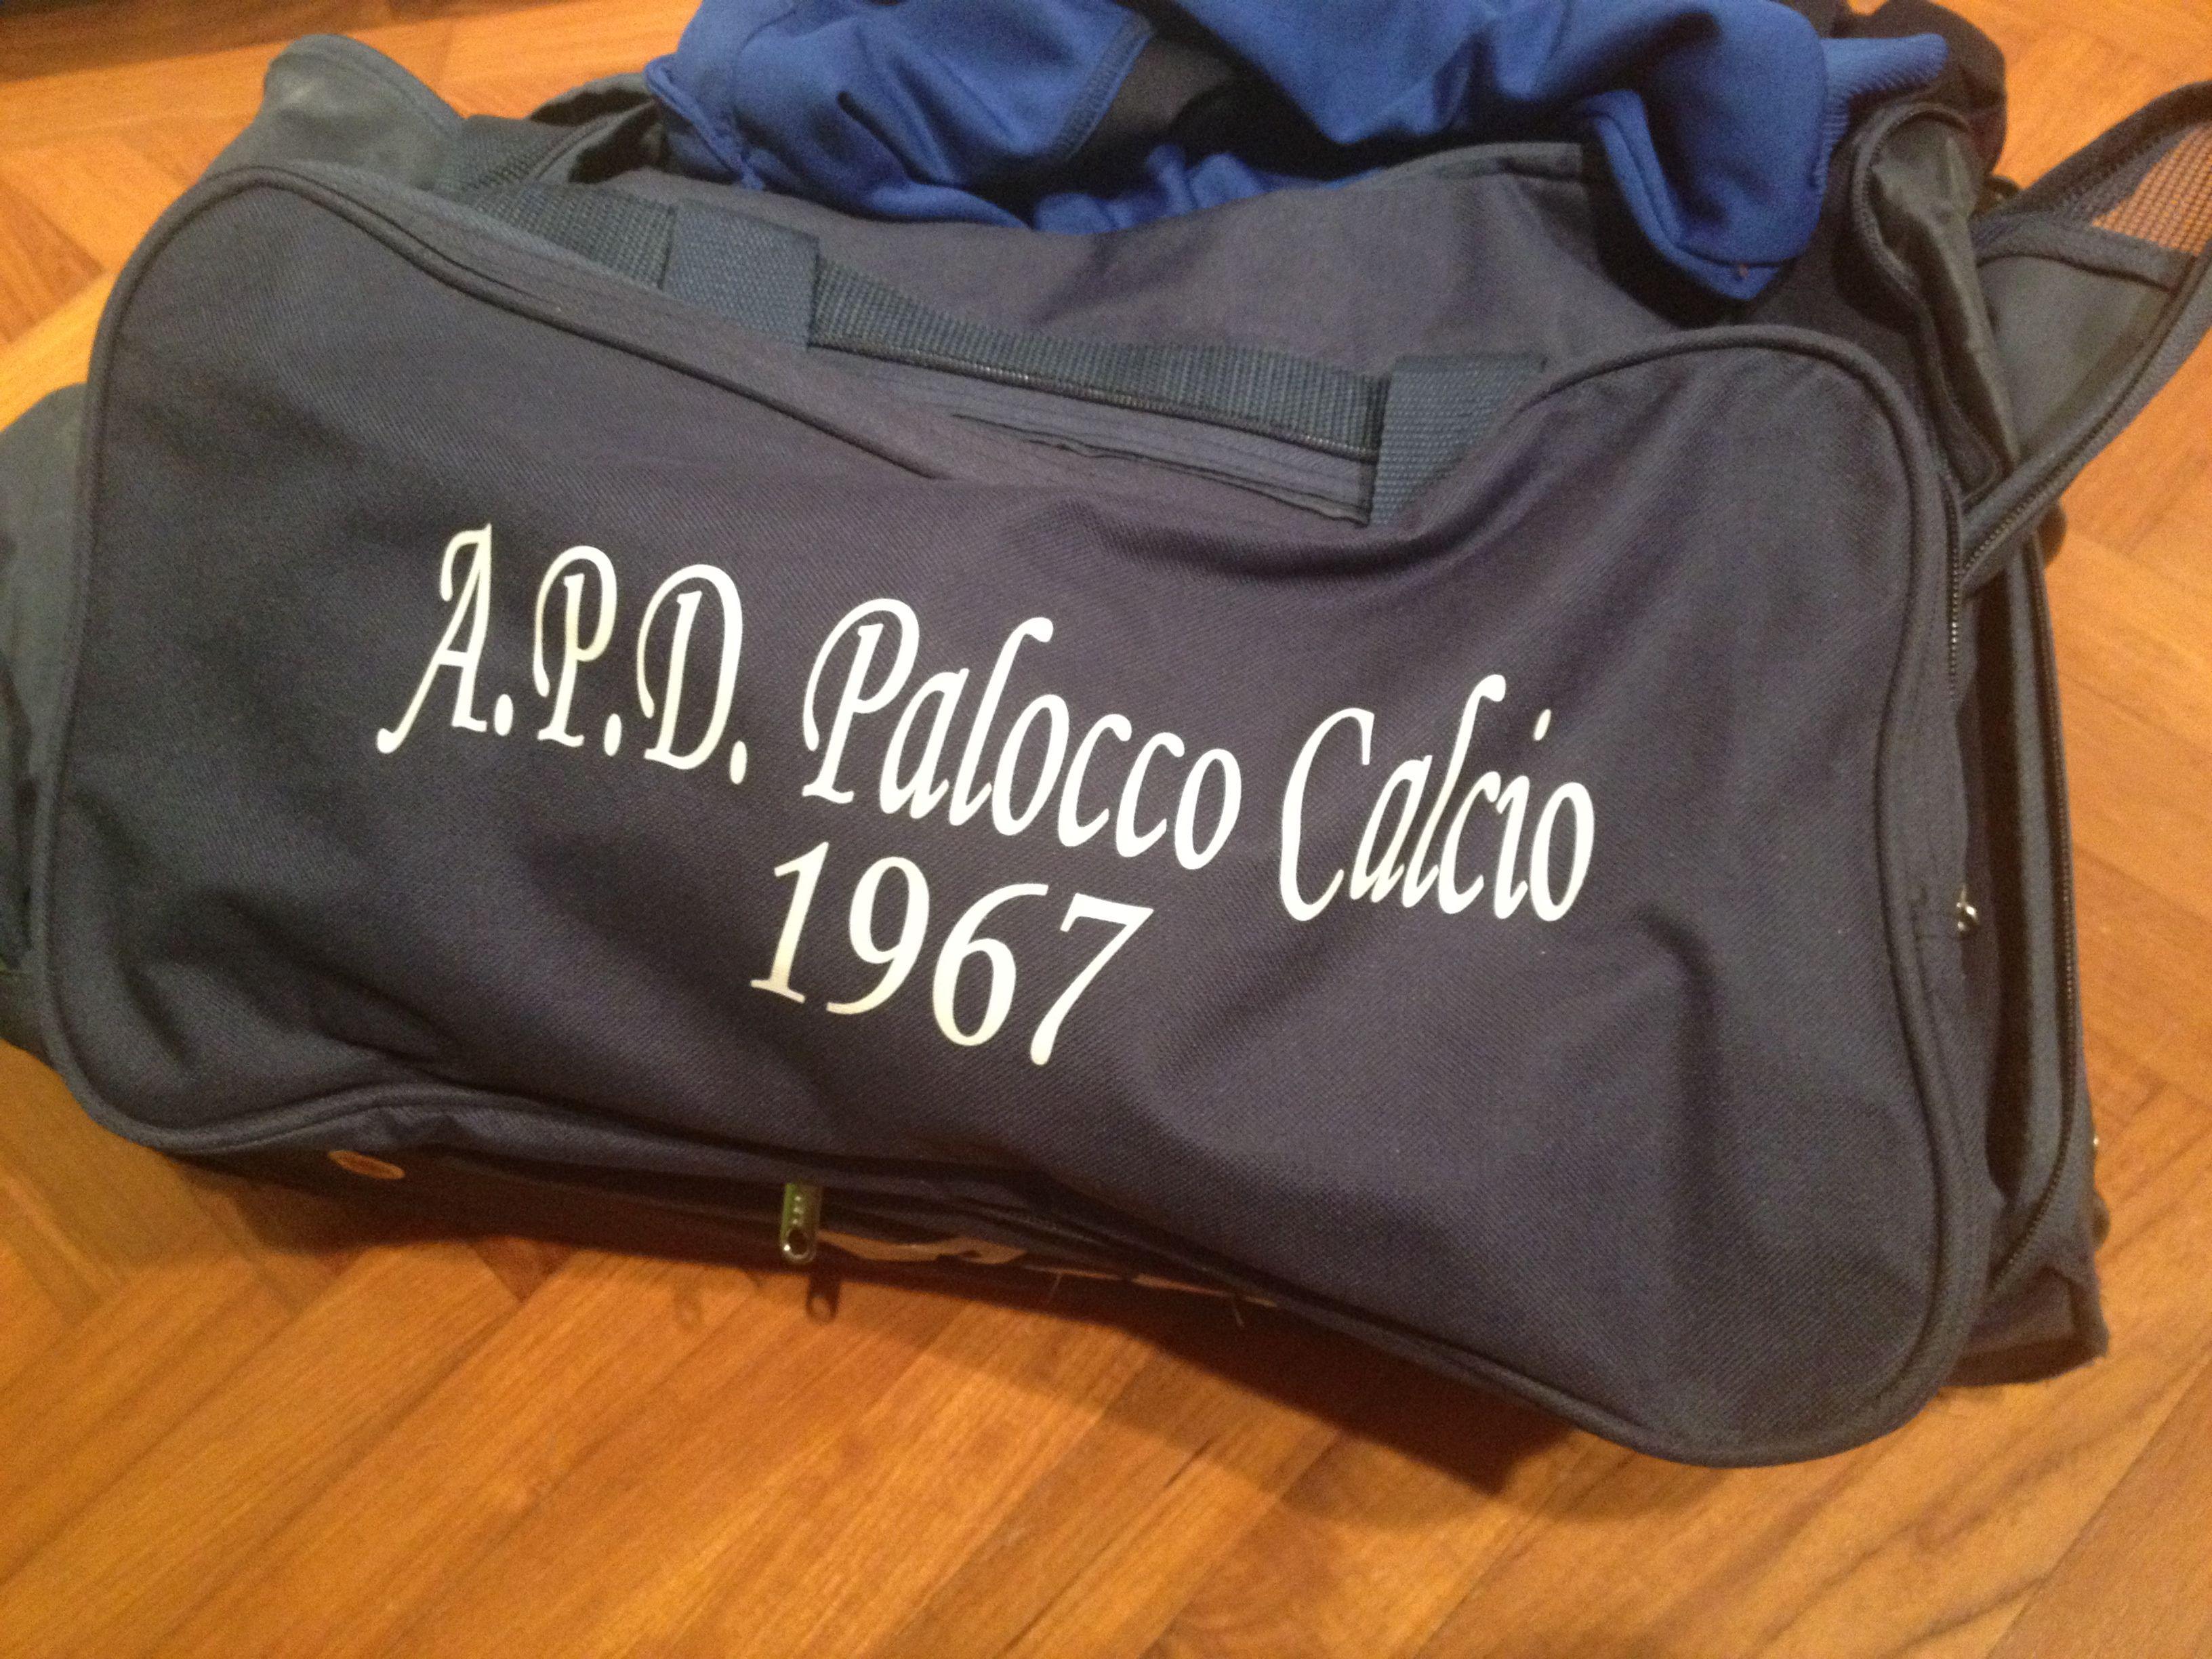 Polisportiva Palocco